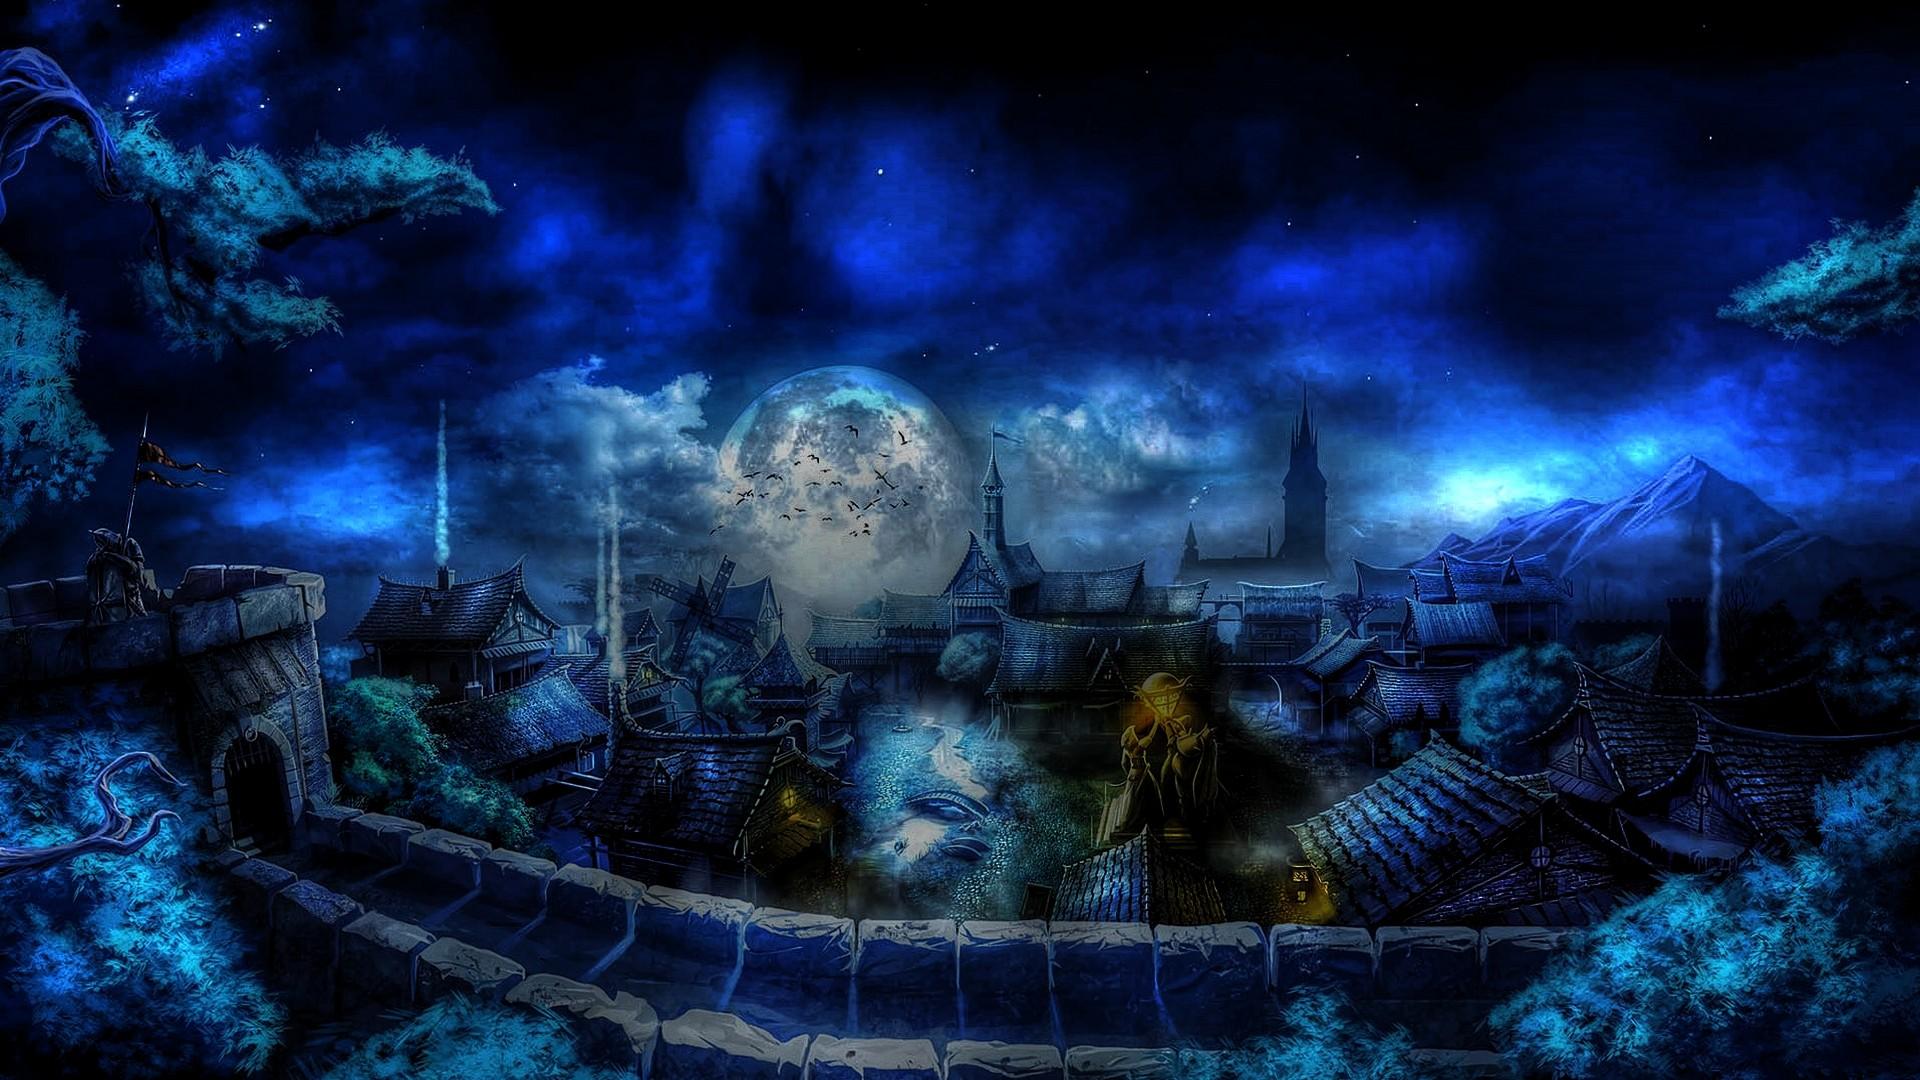 Res: 1920x1080, Trine 2 Fantasy World Wallpaper HD